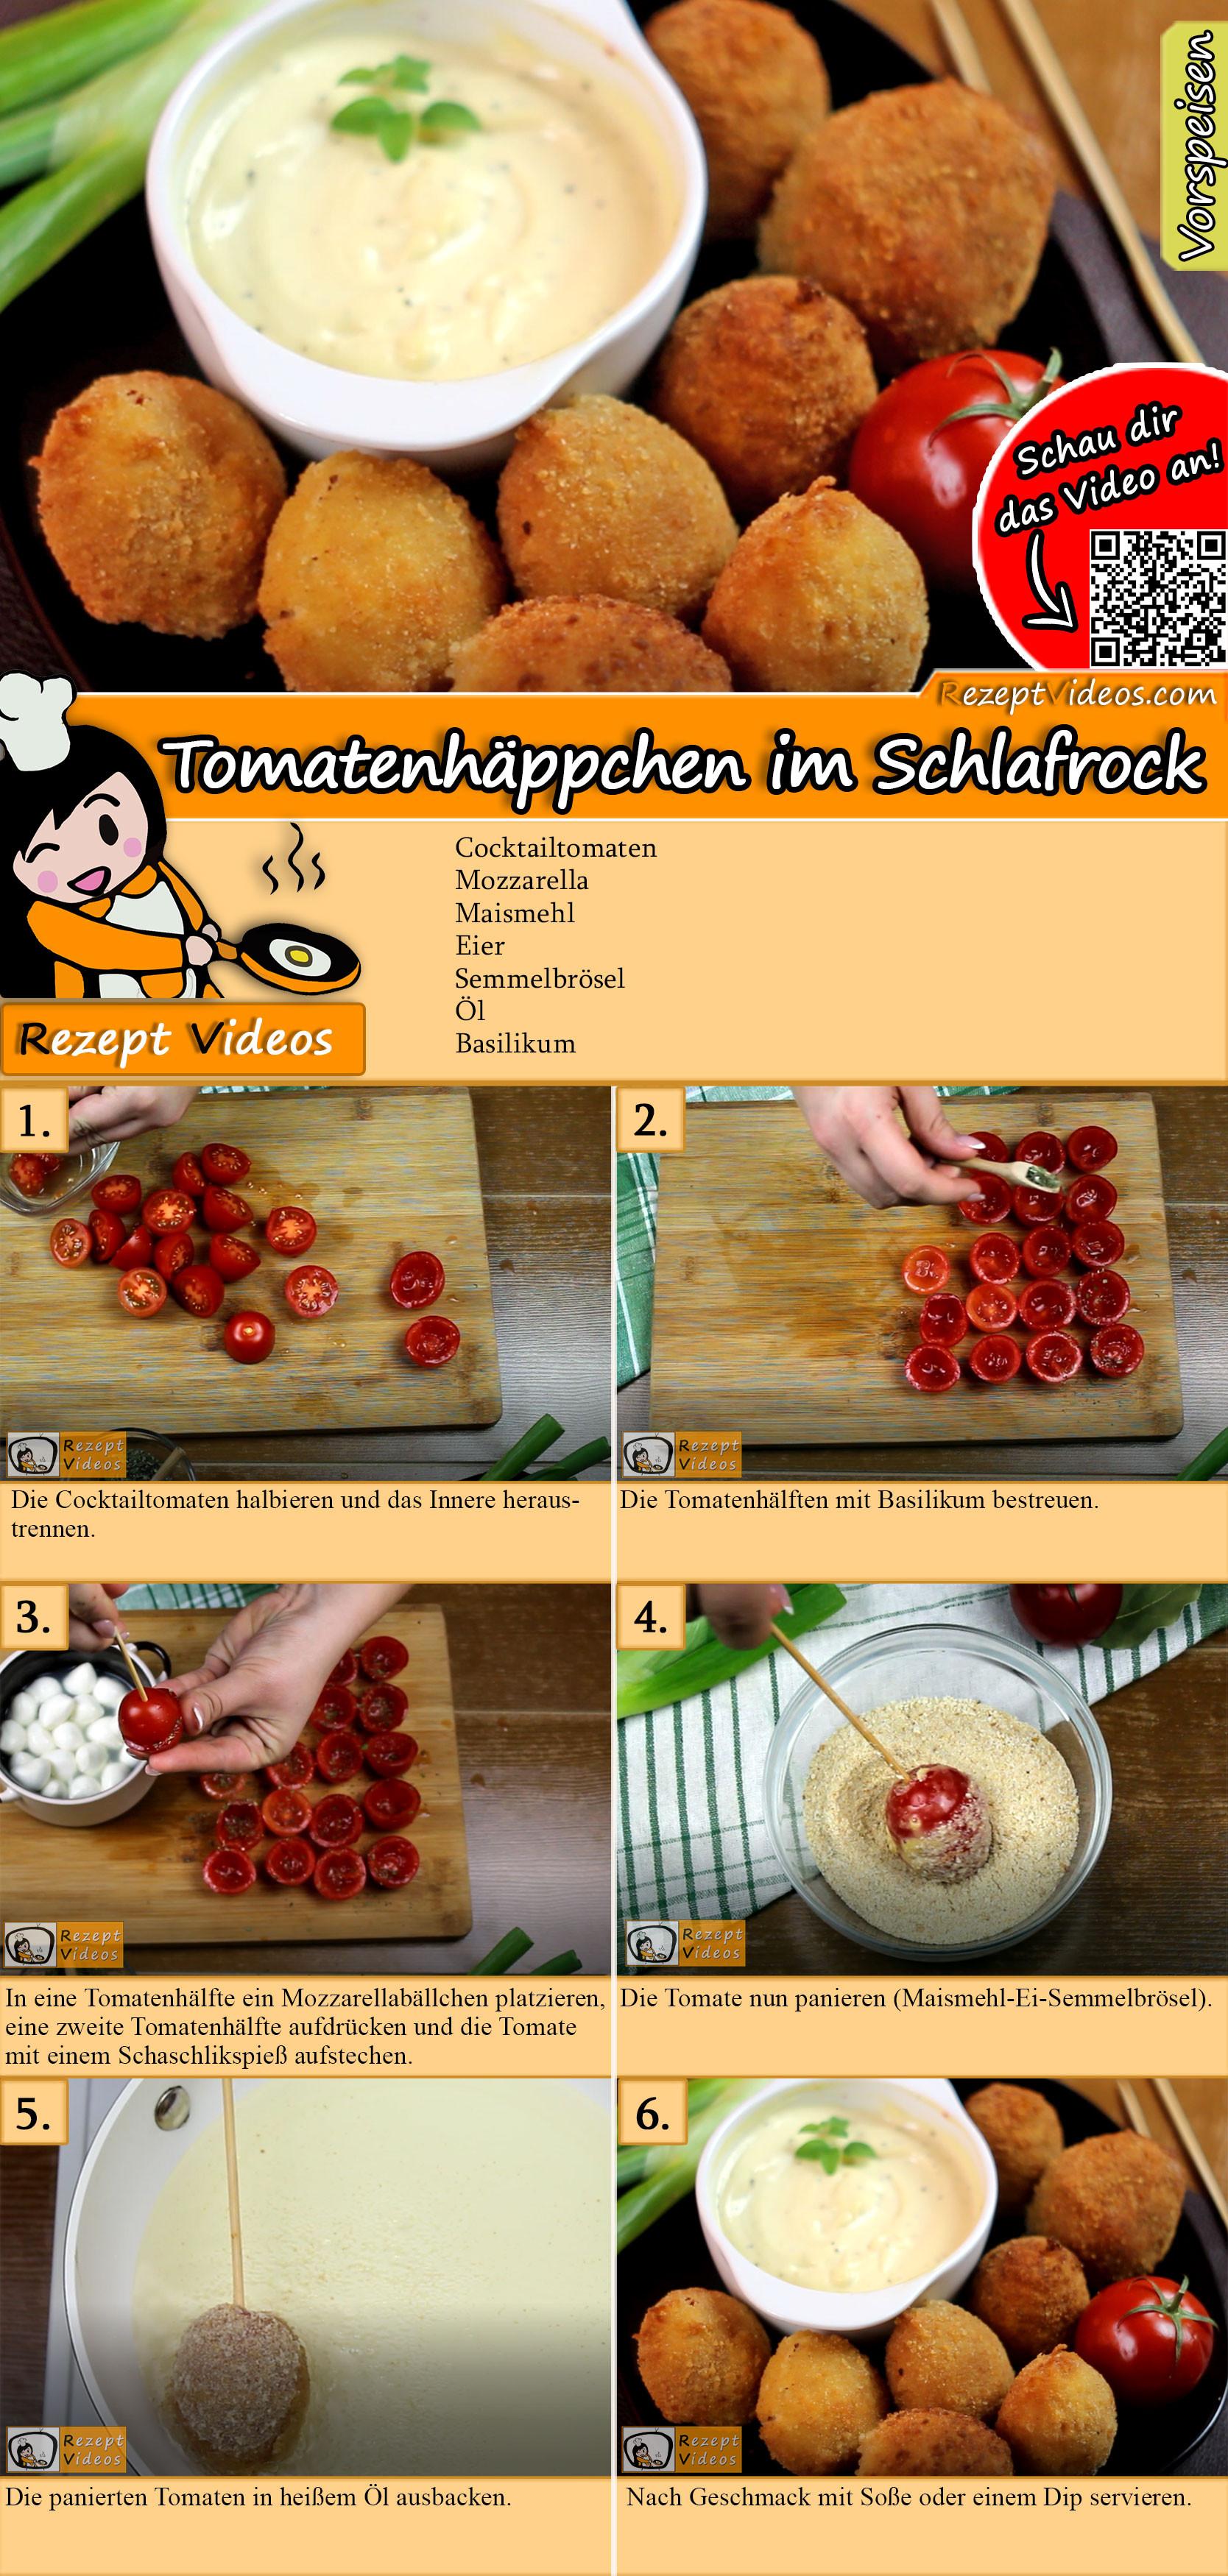 Tomatenhäppchen im Schlafrock Rezept mit Video